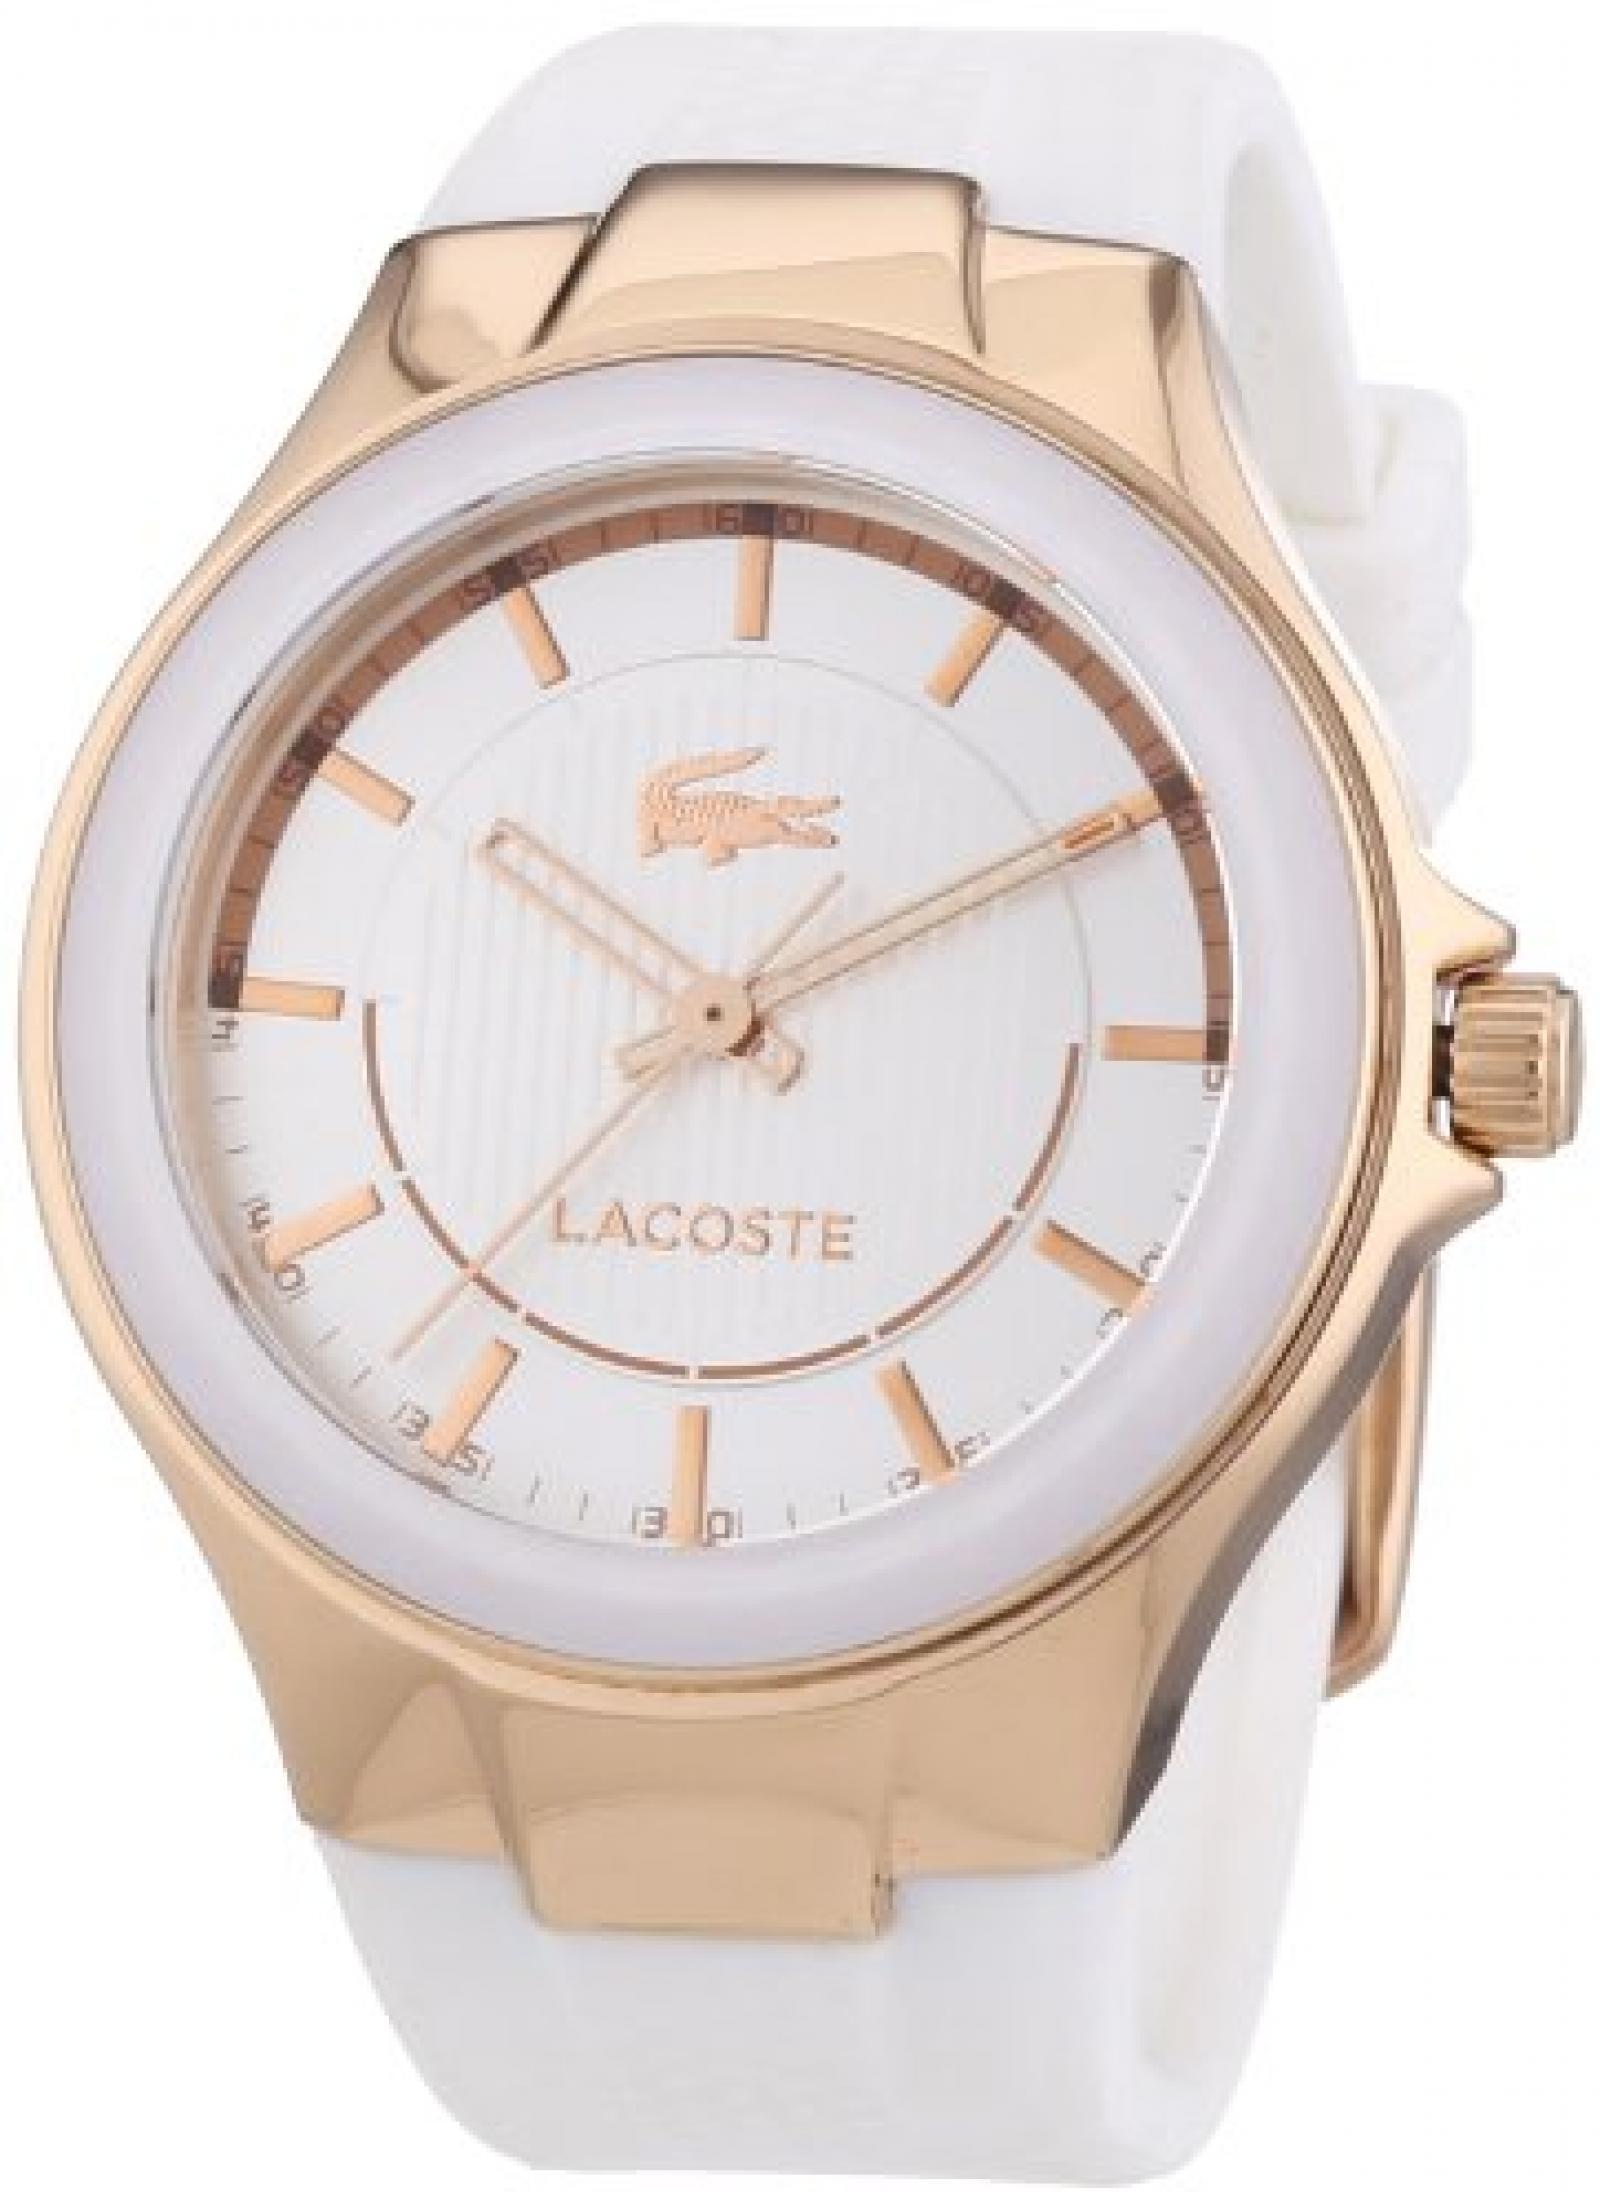 Lacoste Damen-Armbanduhr Analog Quarz Silikon 2000774